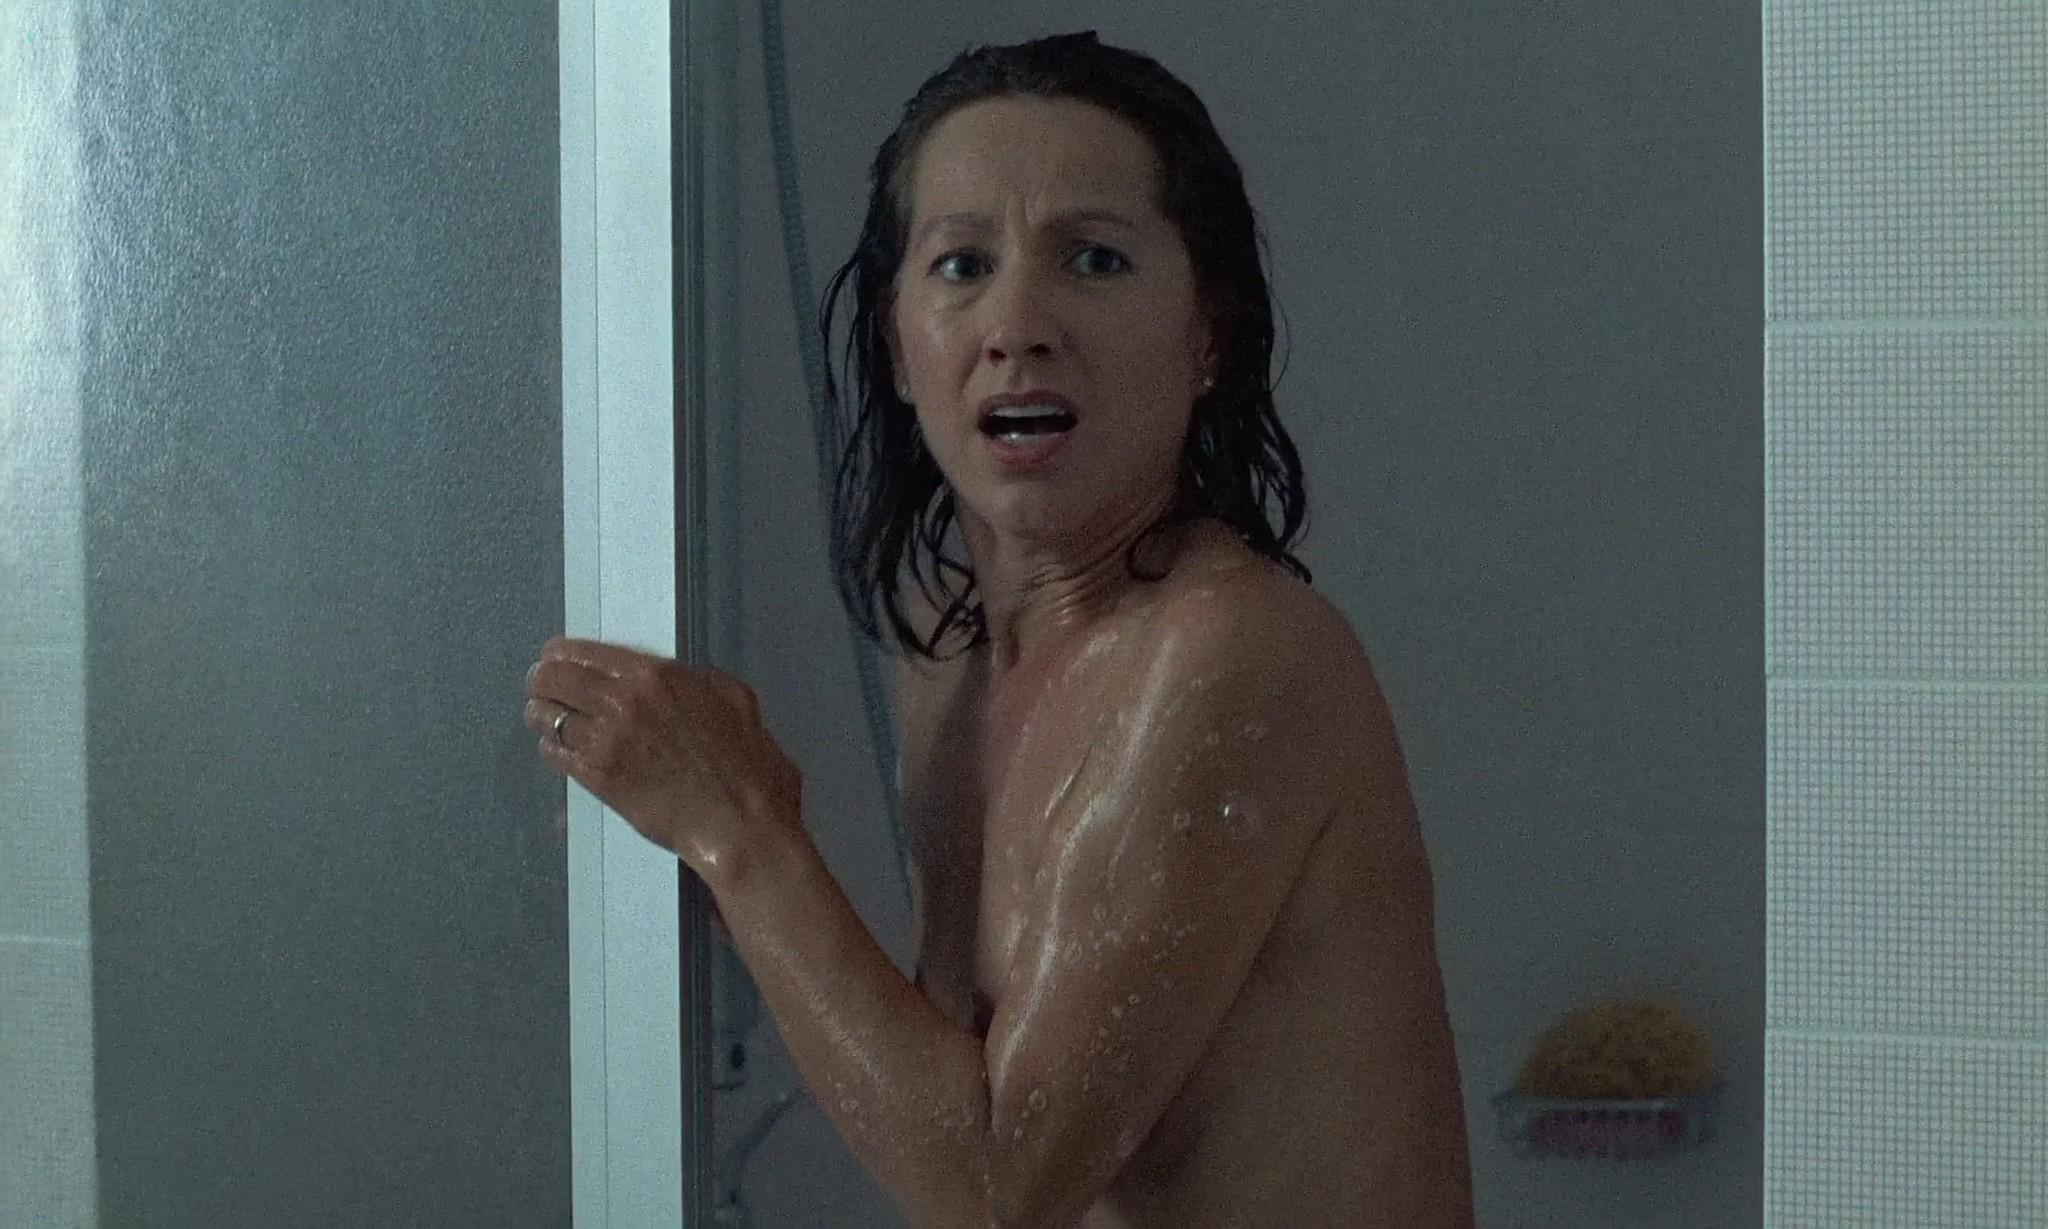 Nathalie Baye nude in the shower En toute innocence FR 1988 1080p BluRay 13